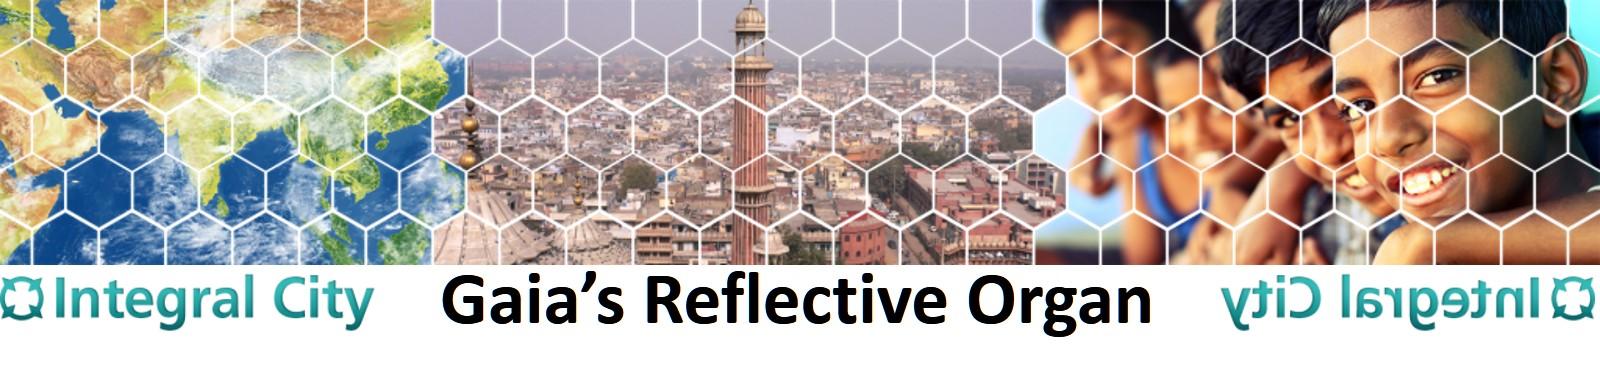 Banner Gaias Reflective Organ jpg